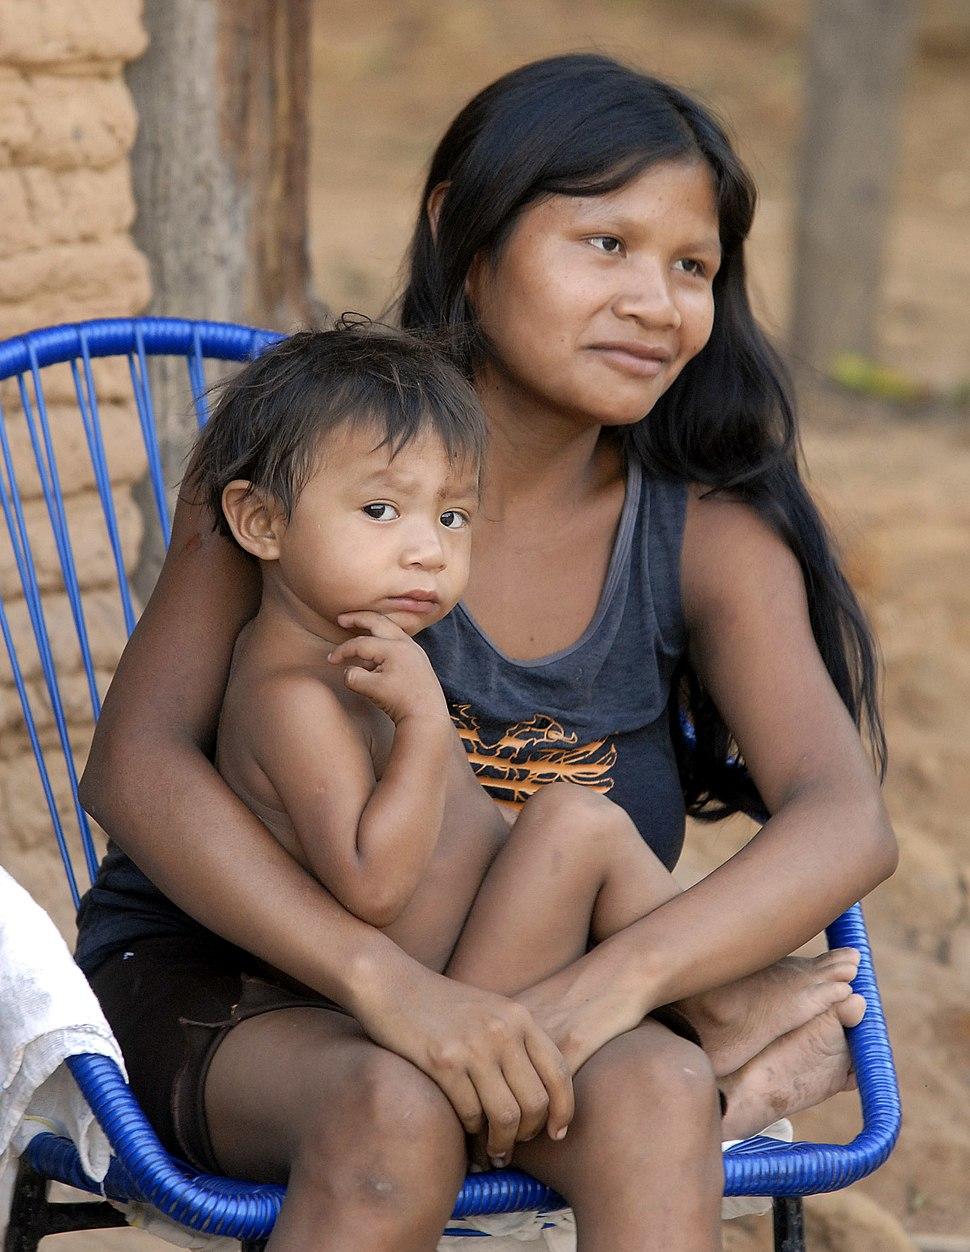 Guajajaras (mãe e filho)